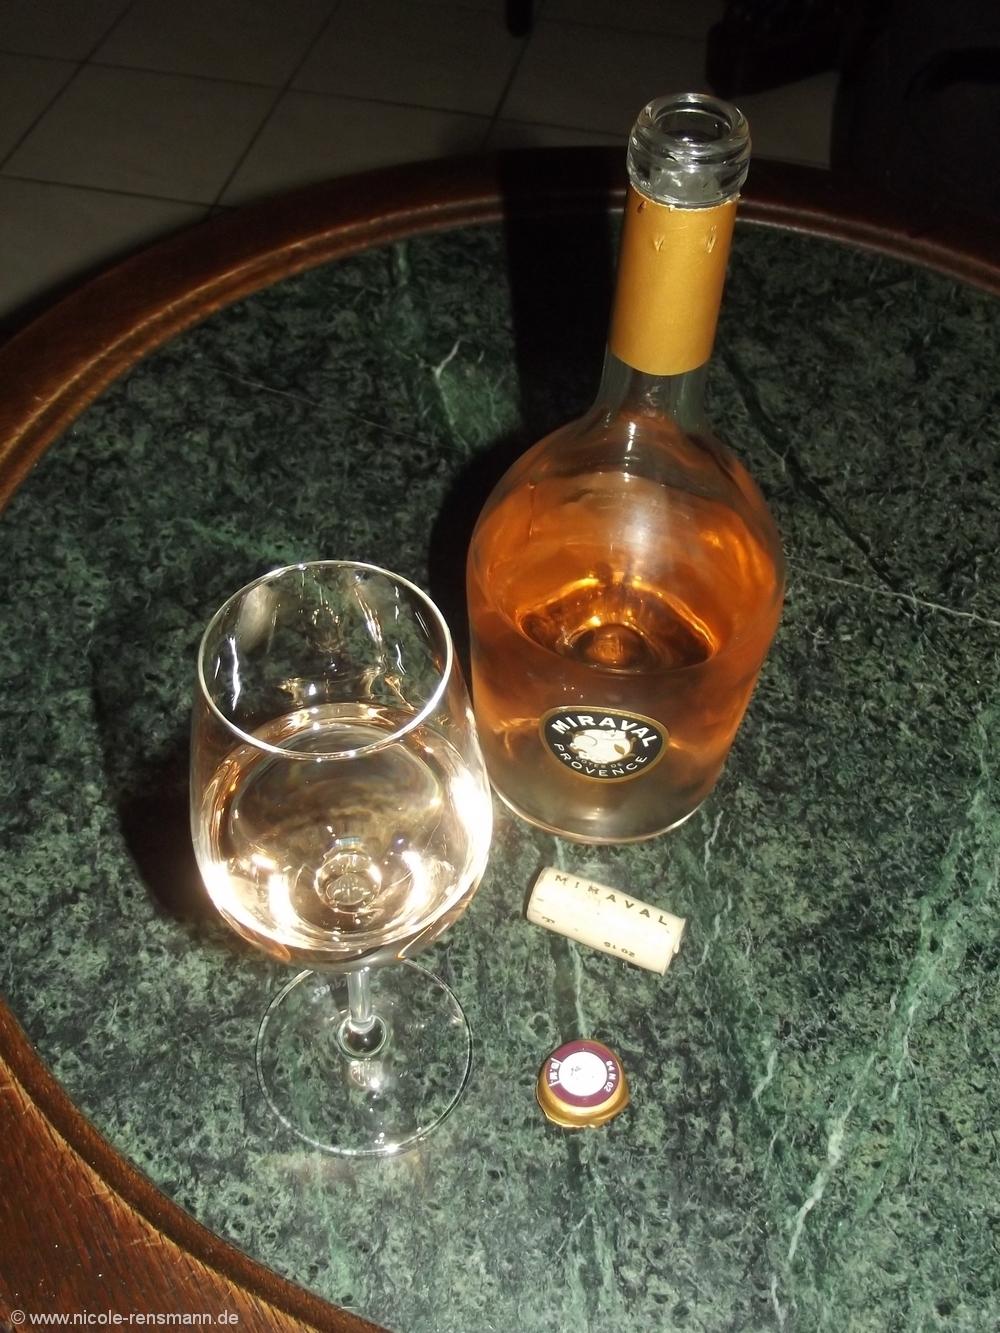 Miravel Rosé vom Weingut JoliePitt & Terrin